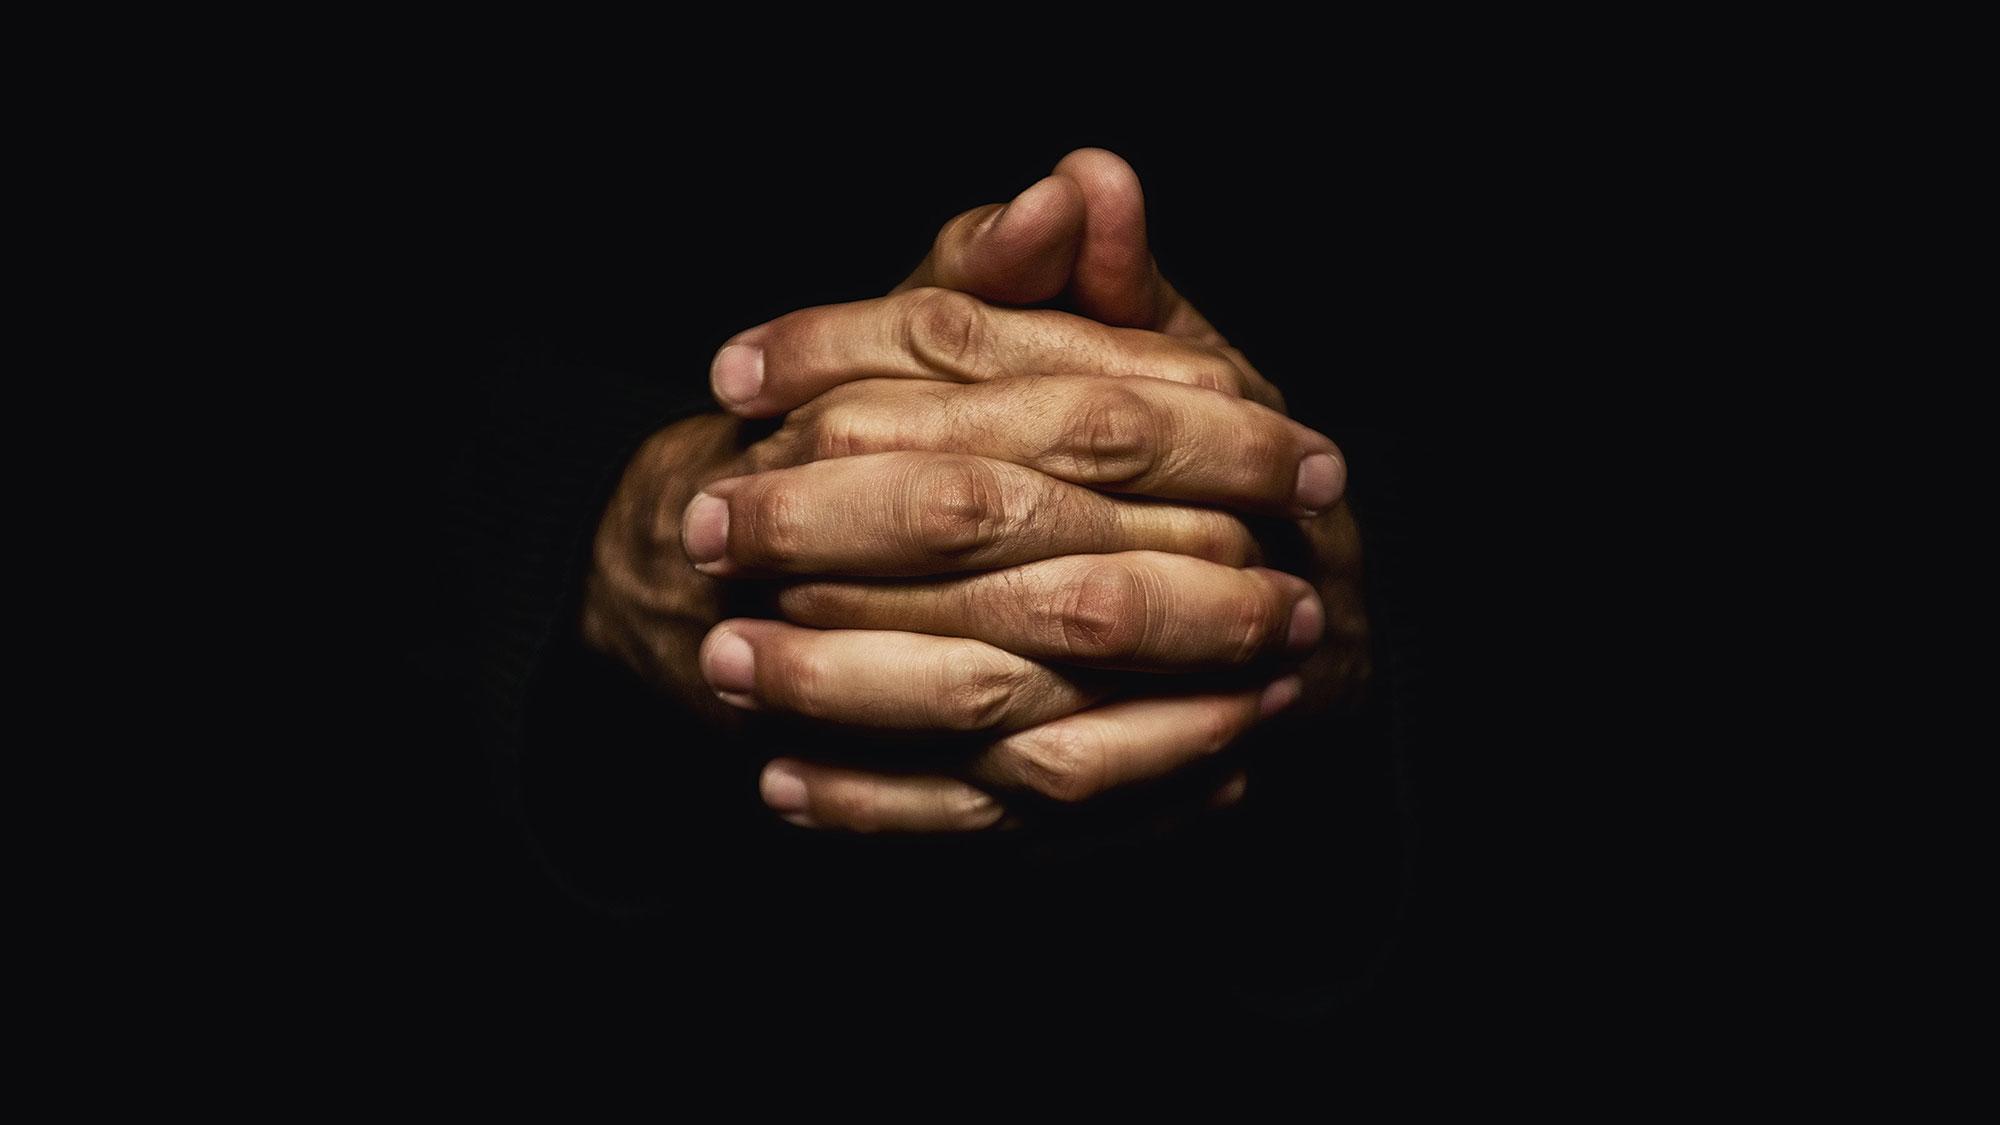 Hands crossed for prayer in the dark.